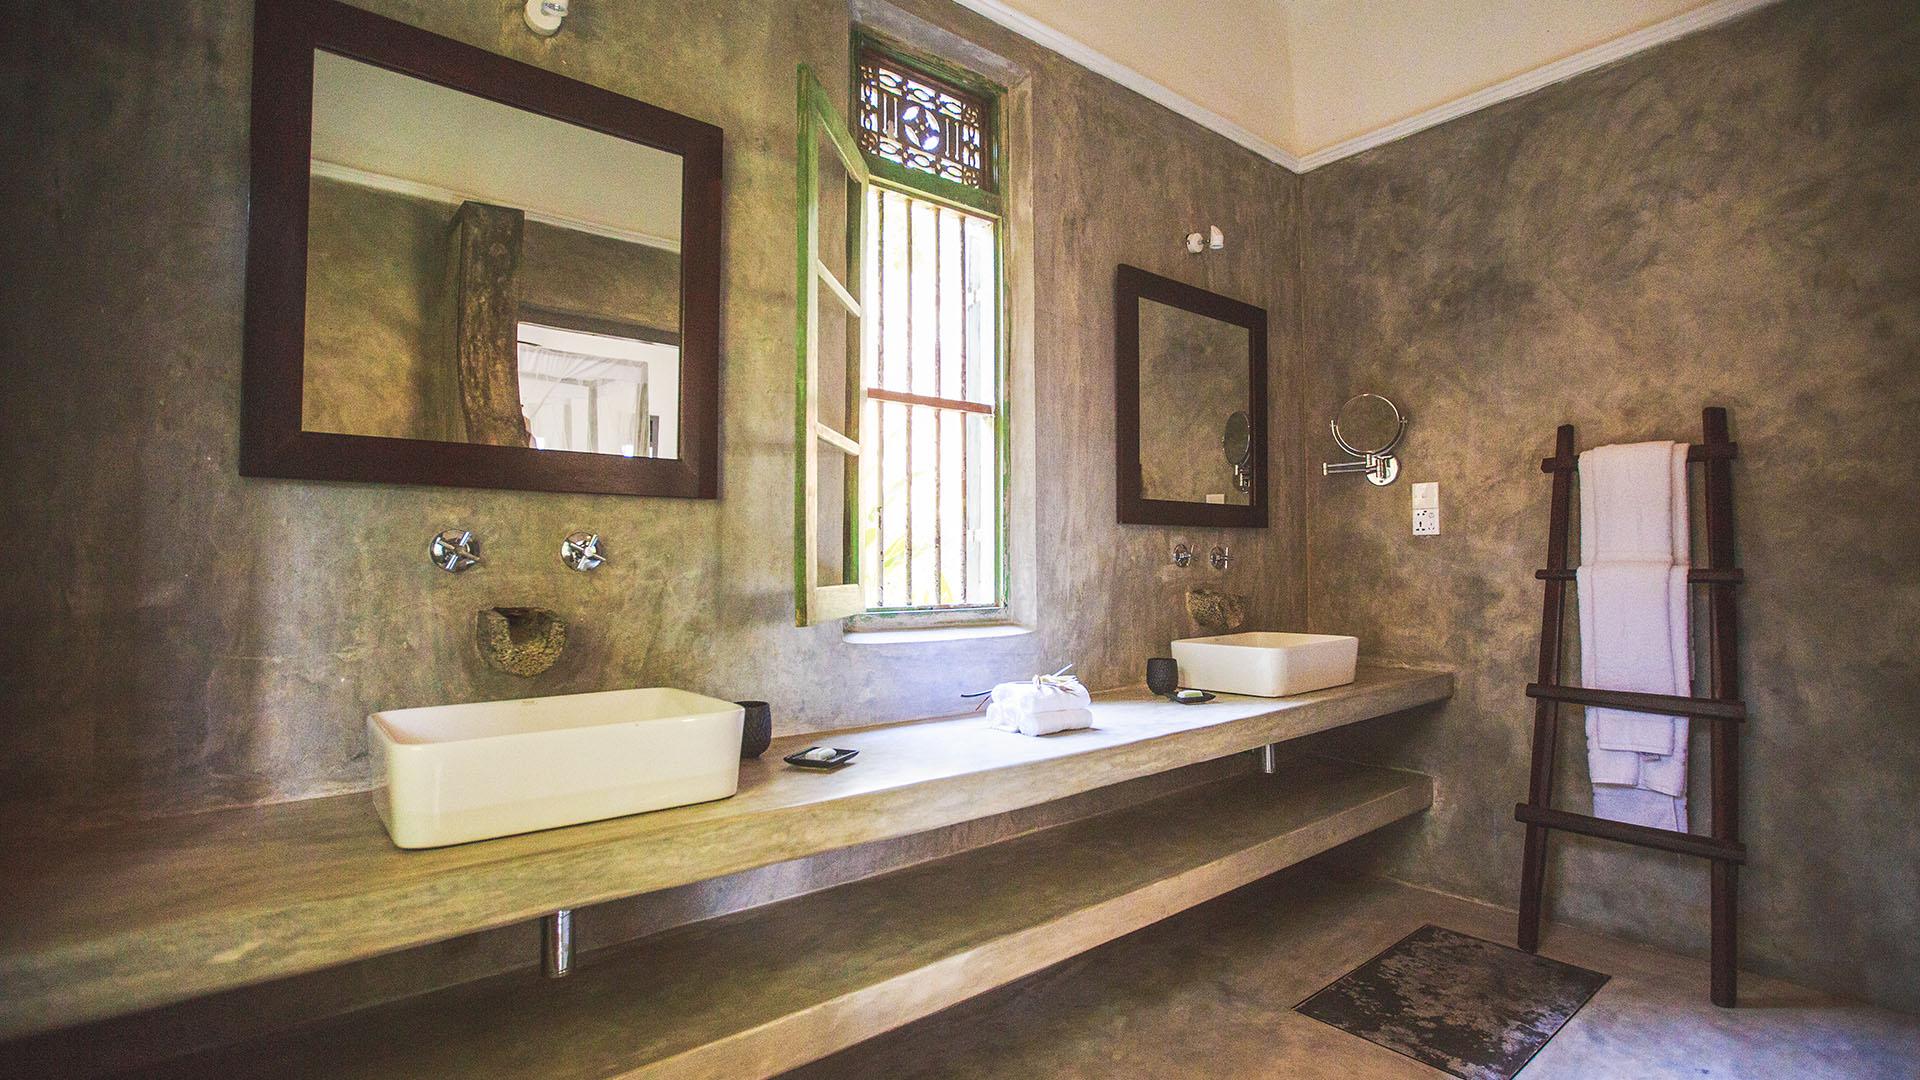 Sri_lanka_holiday_villa_sissila_family_suite1Sri_lanka_holiday_villa_sissila_family suitel_05.jpg